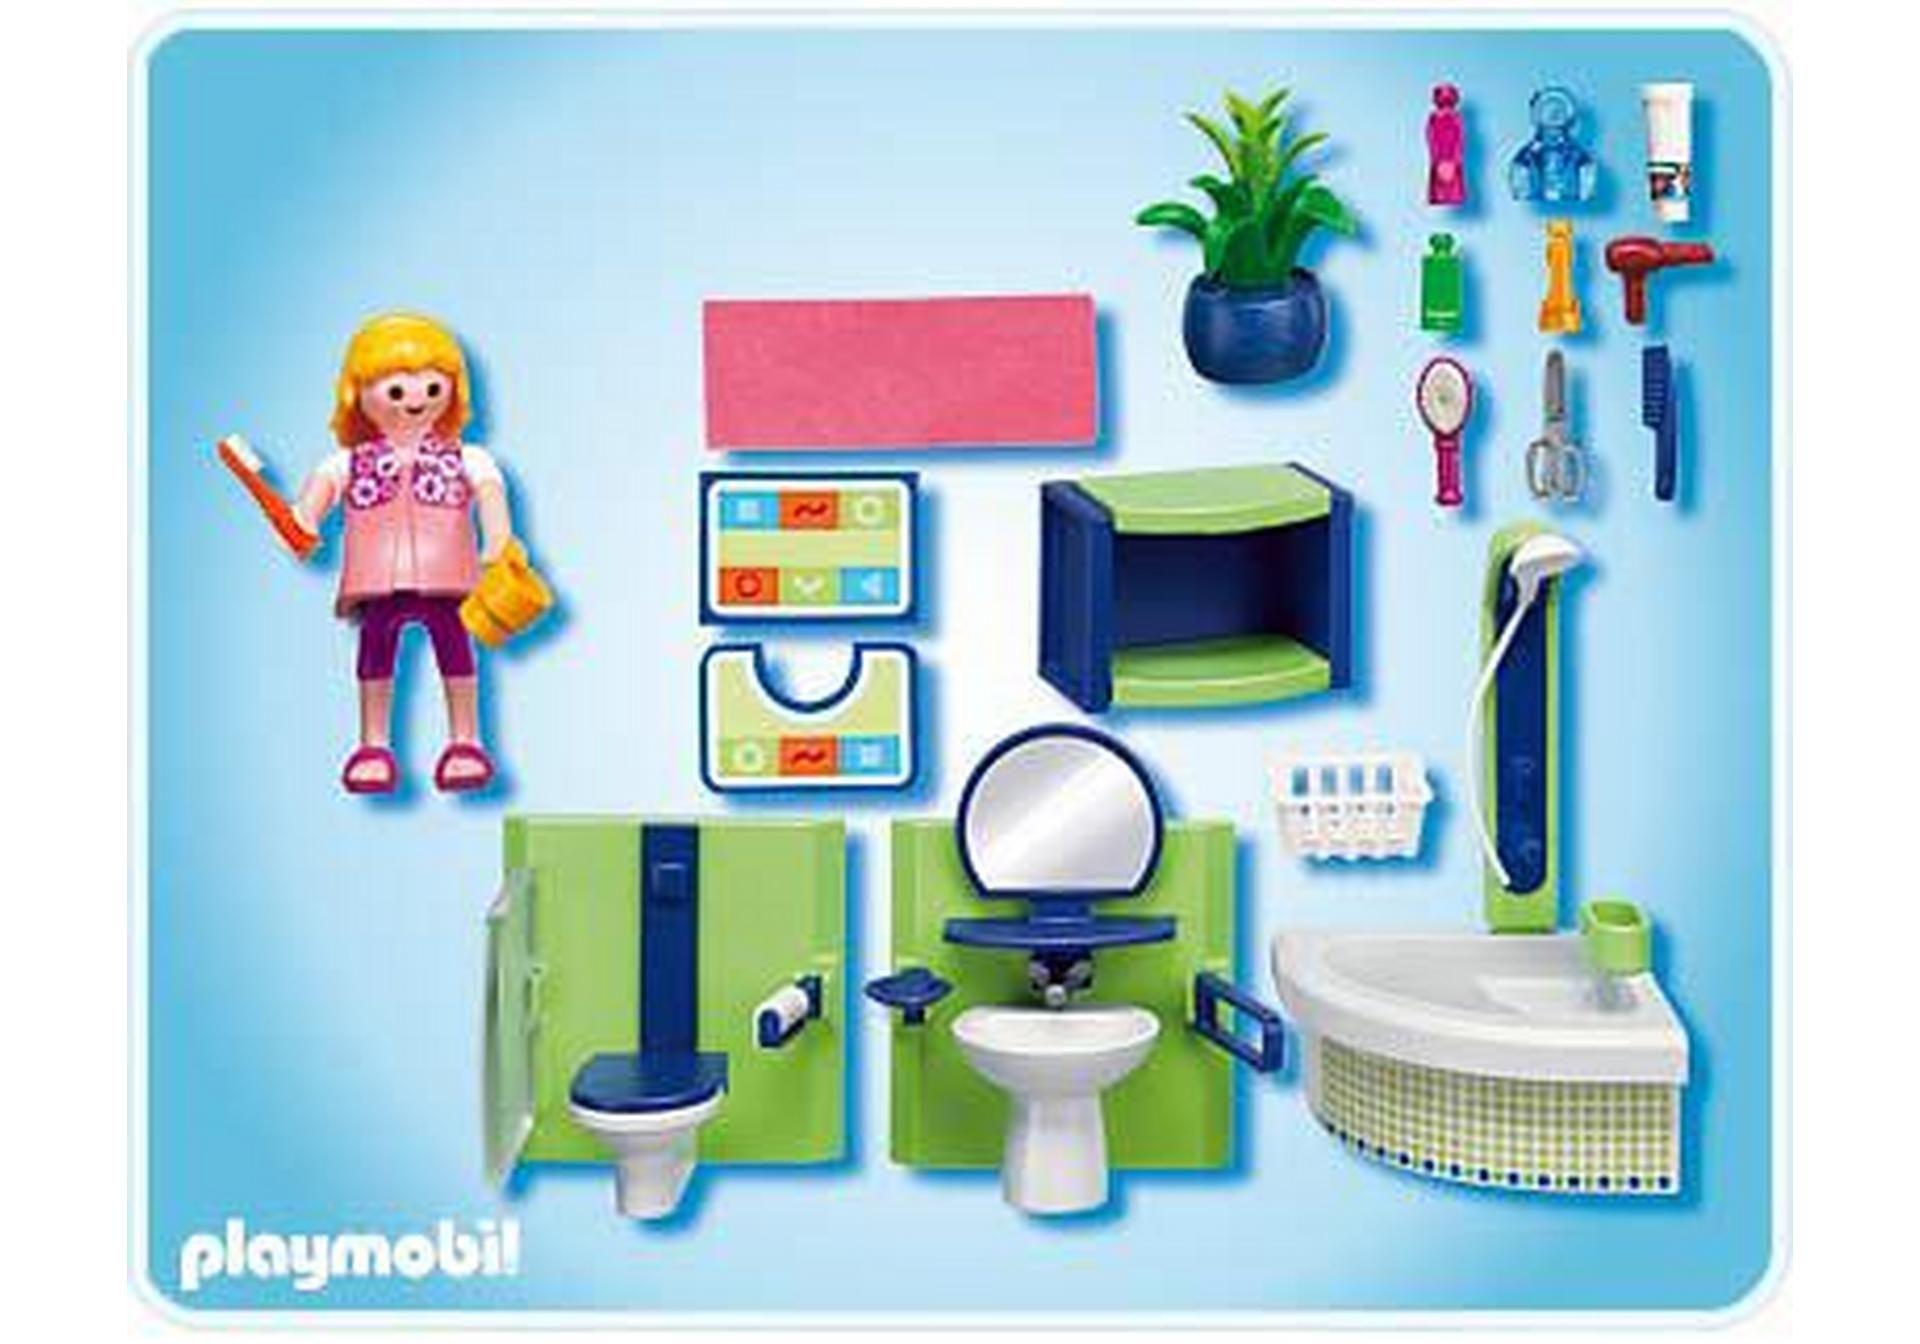 Bildergebnis für playmobil bad | saskia | Pinterest | Playmobil